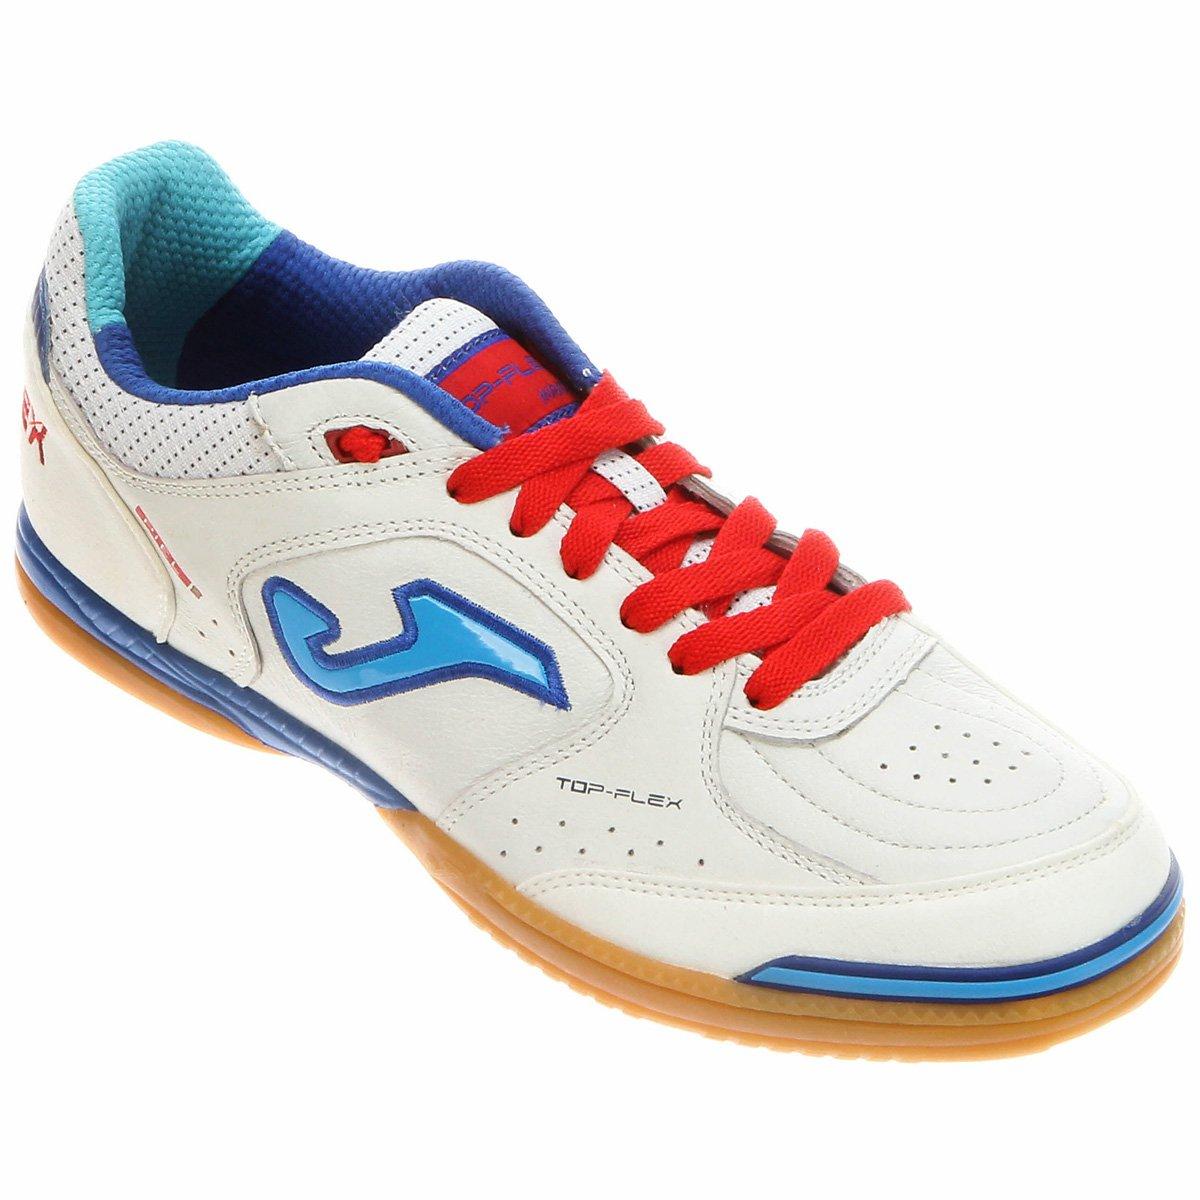 200ddae2876 Chuteira Joma Top Flex Futsal - Compre Agora